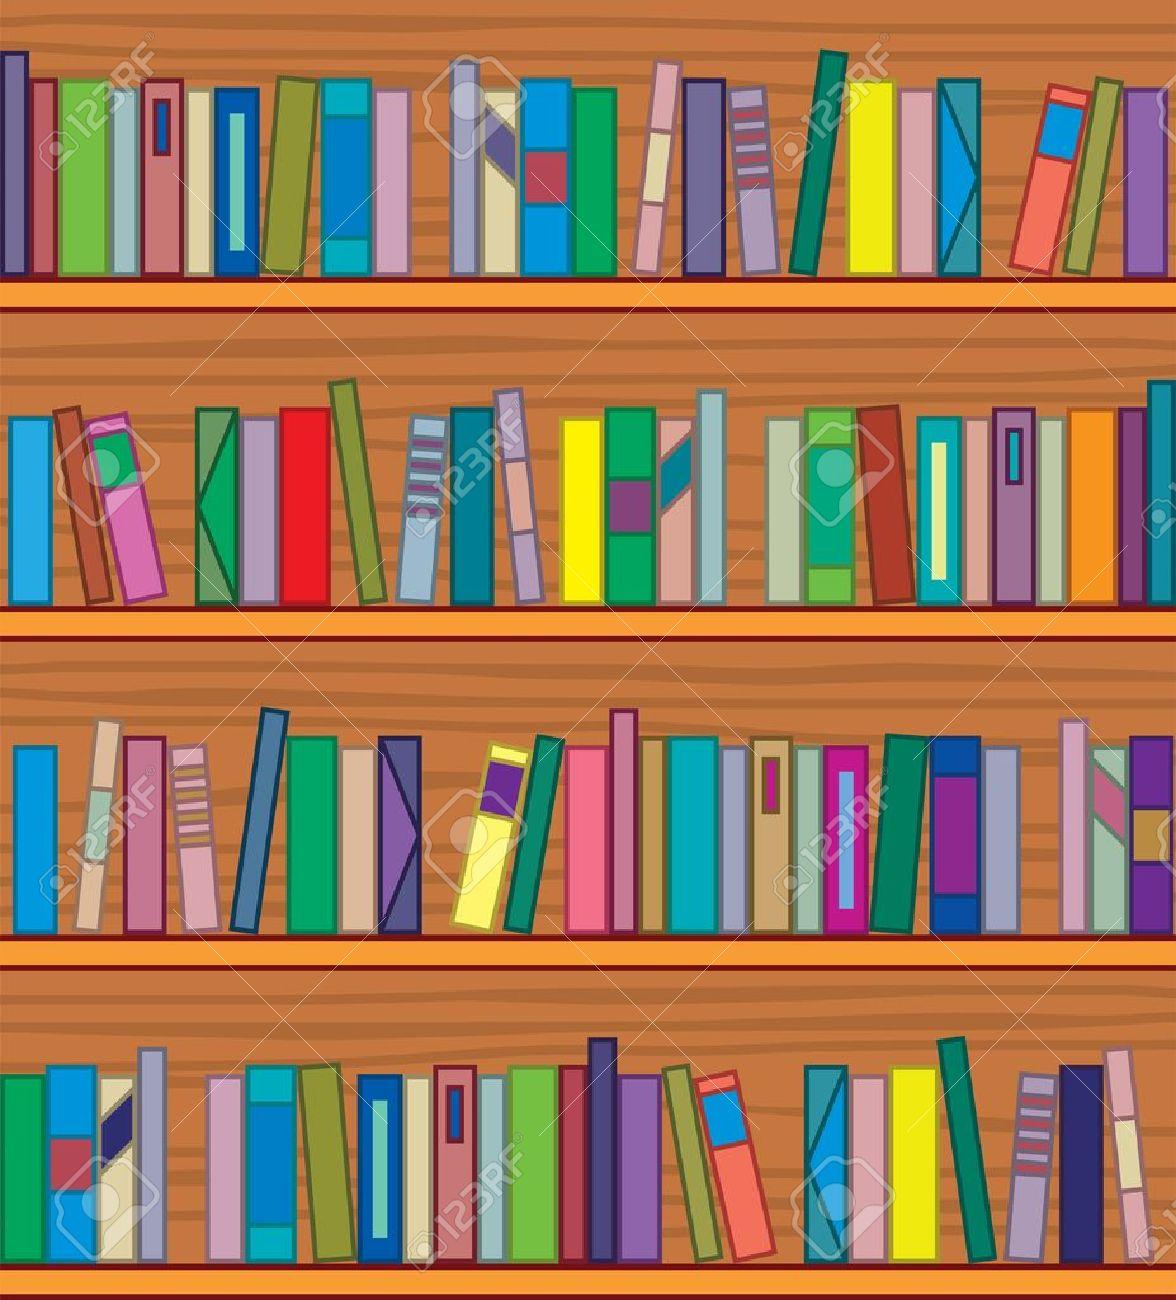 Library Bookshelf Clipart library bookshelf  clipart of